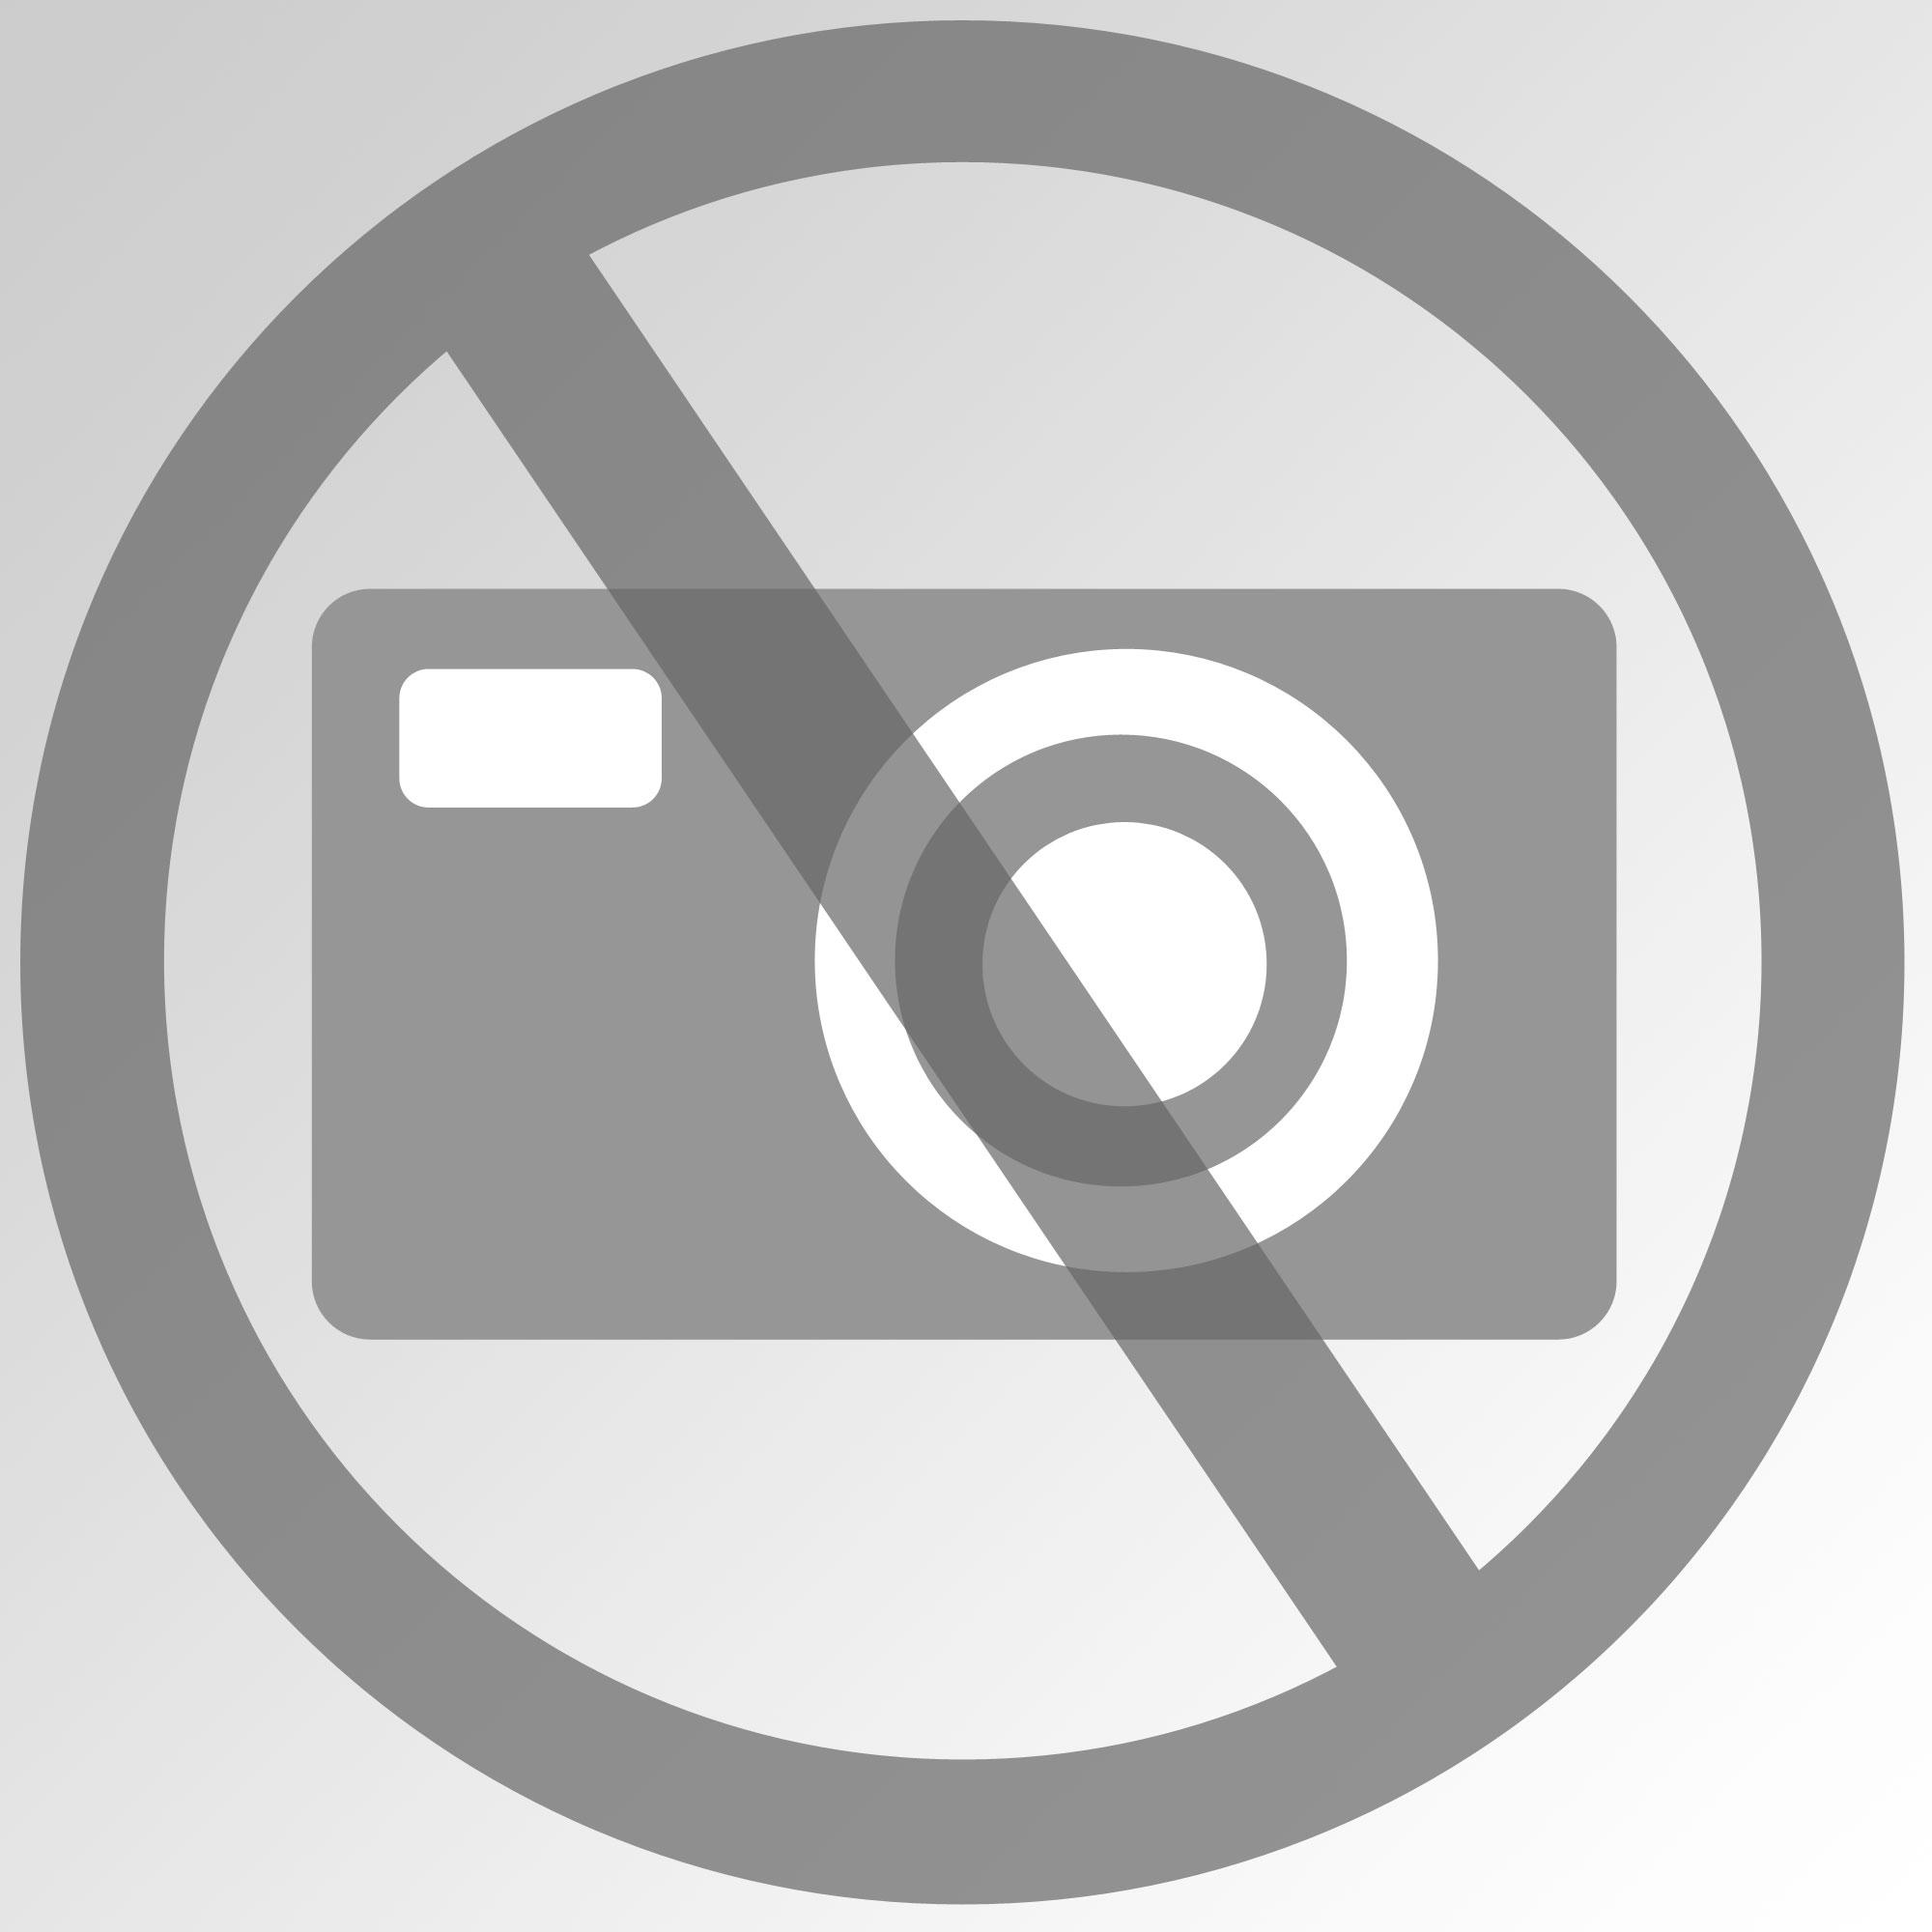 Chemieschutzoverall weiß, XL EN 13982-1/13034/1073-2/14126/